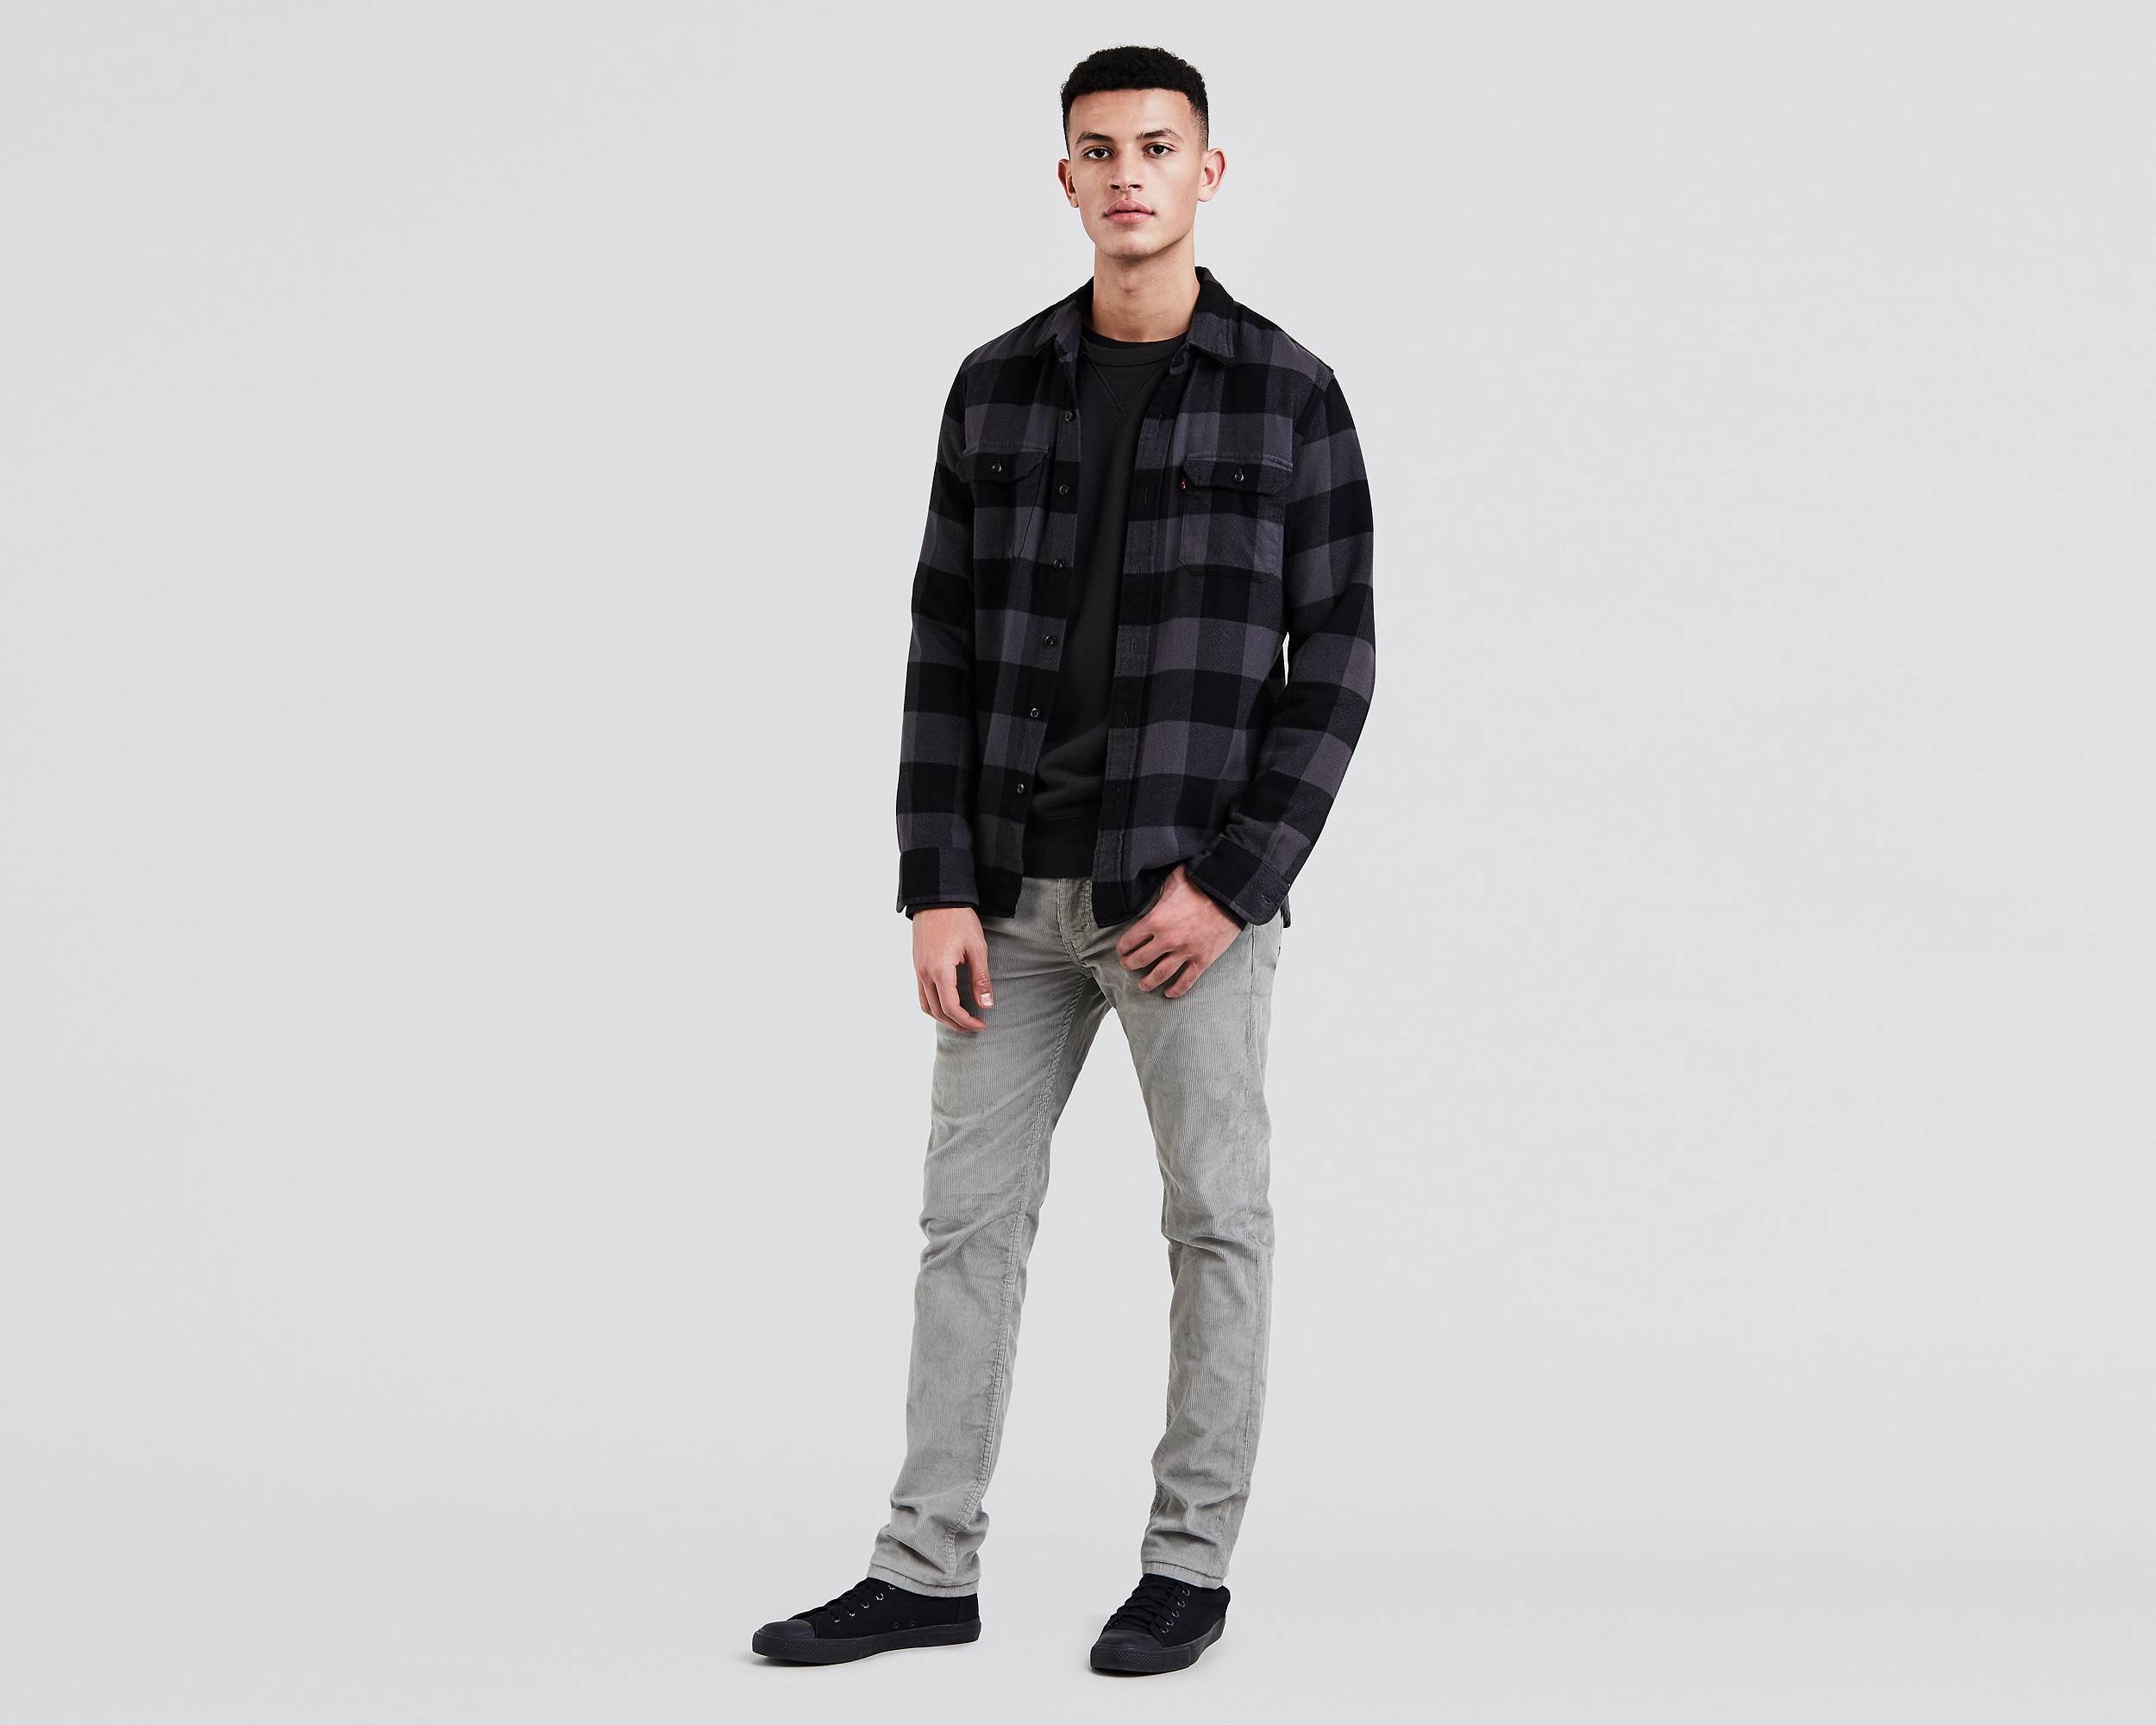 511™ Slim Fit Corduroy Pants | Griffin |Levi's® United States (US)